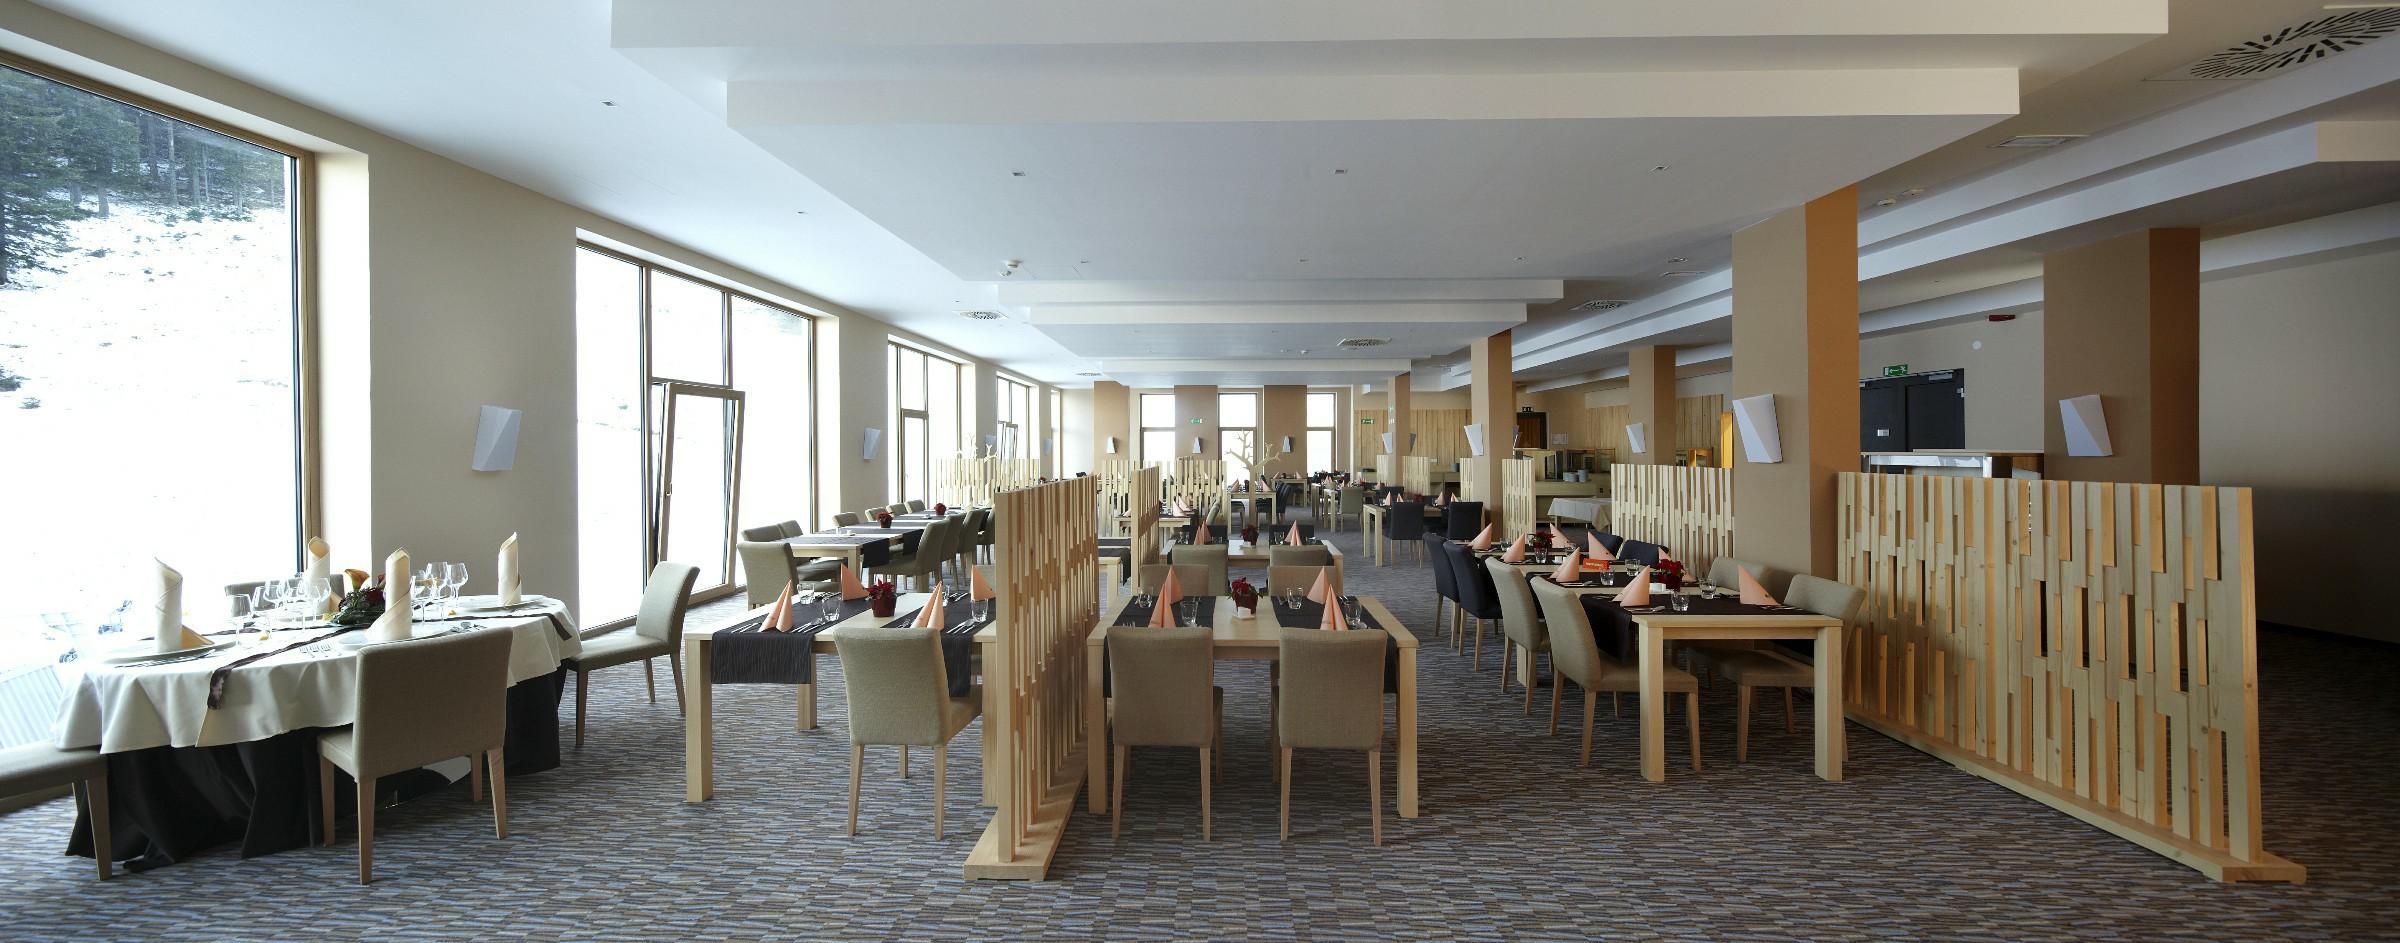 Hotel_Golte (3)